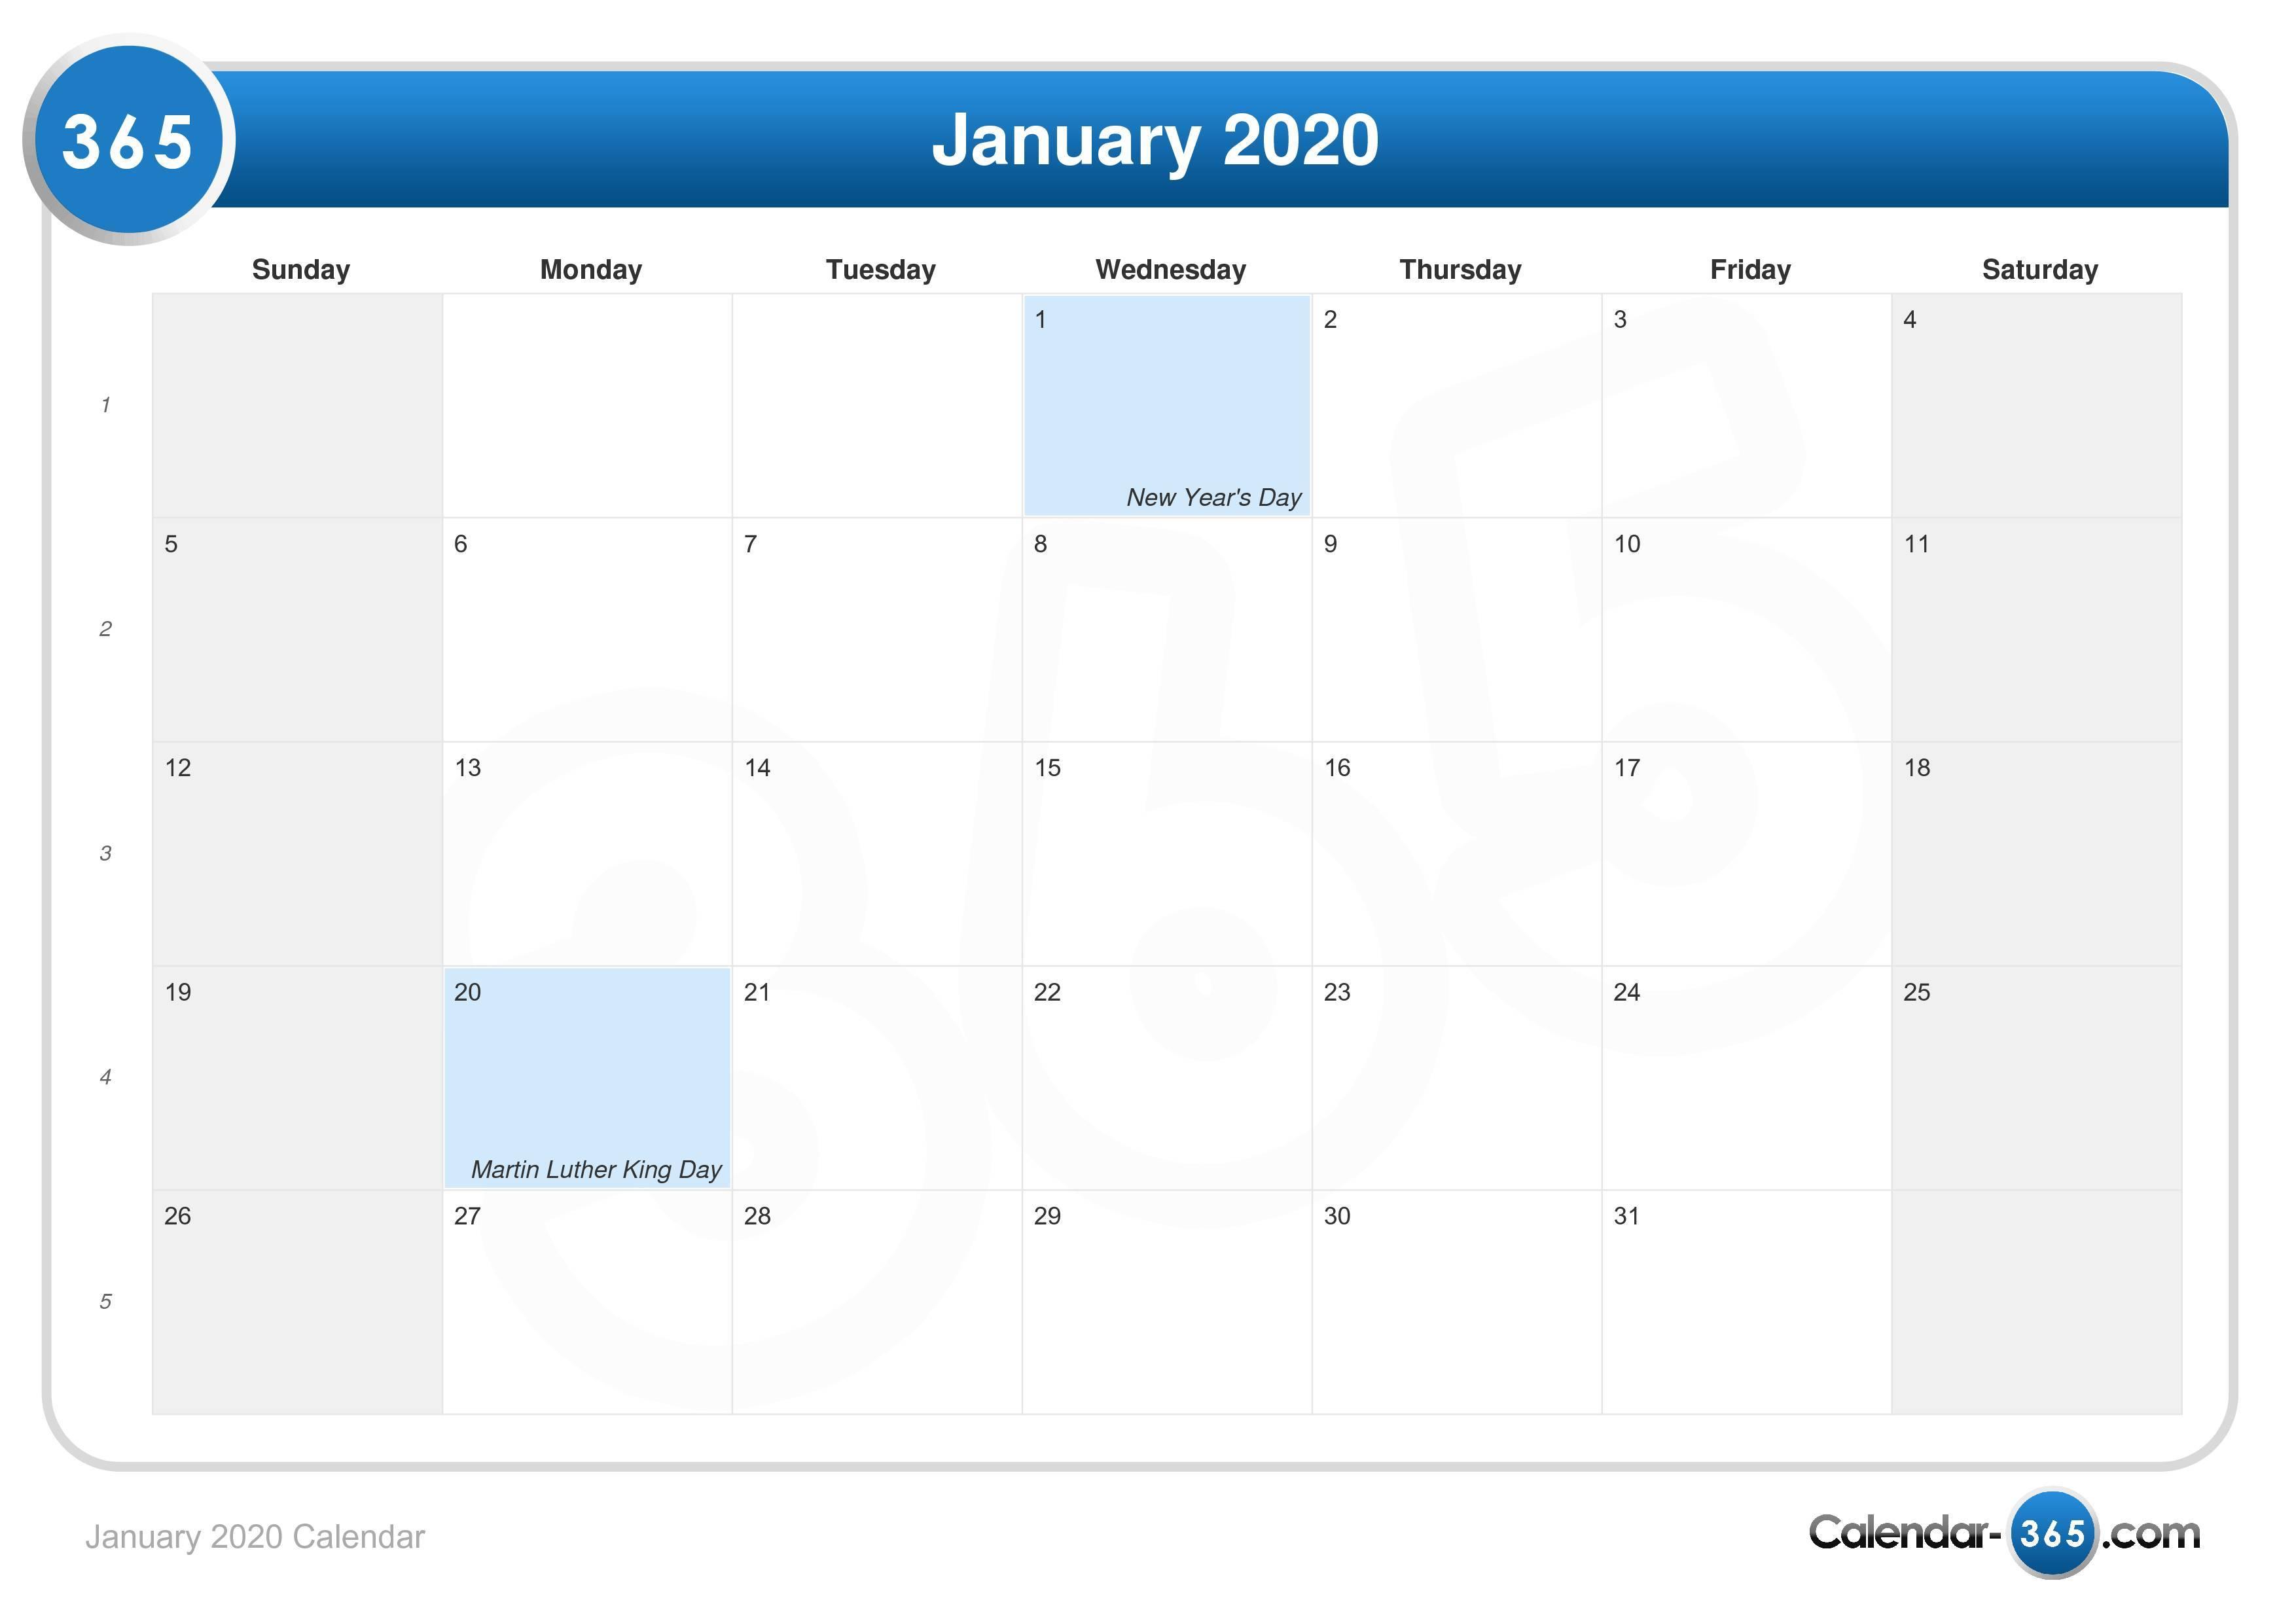 January 1 2020 Calendar January 2020 Calendar